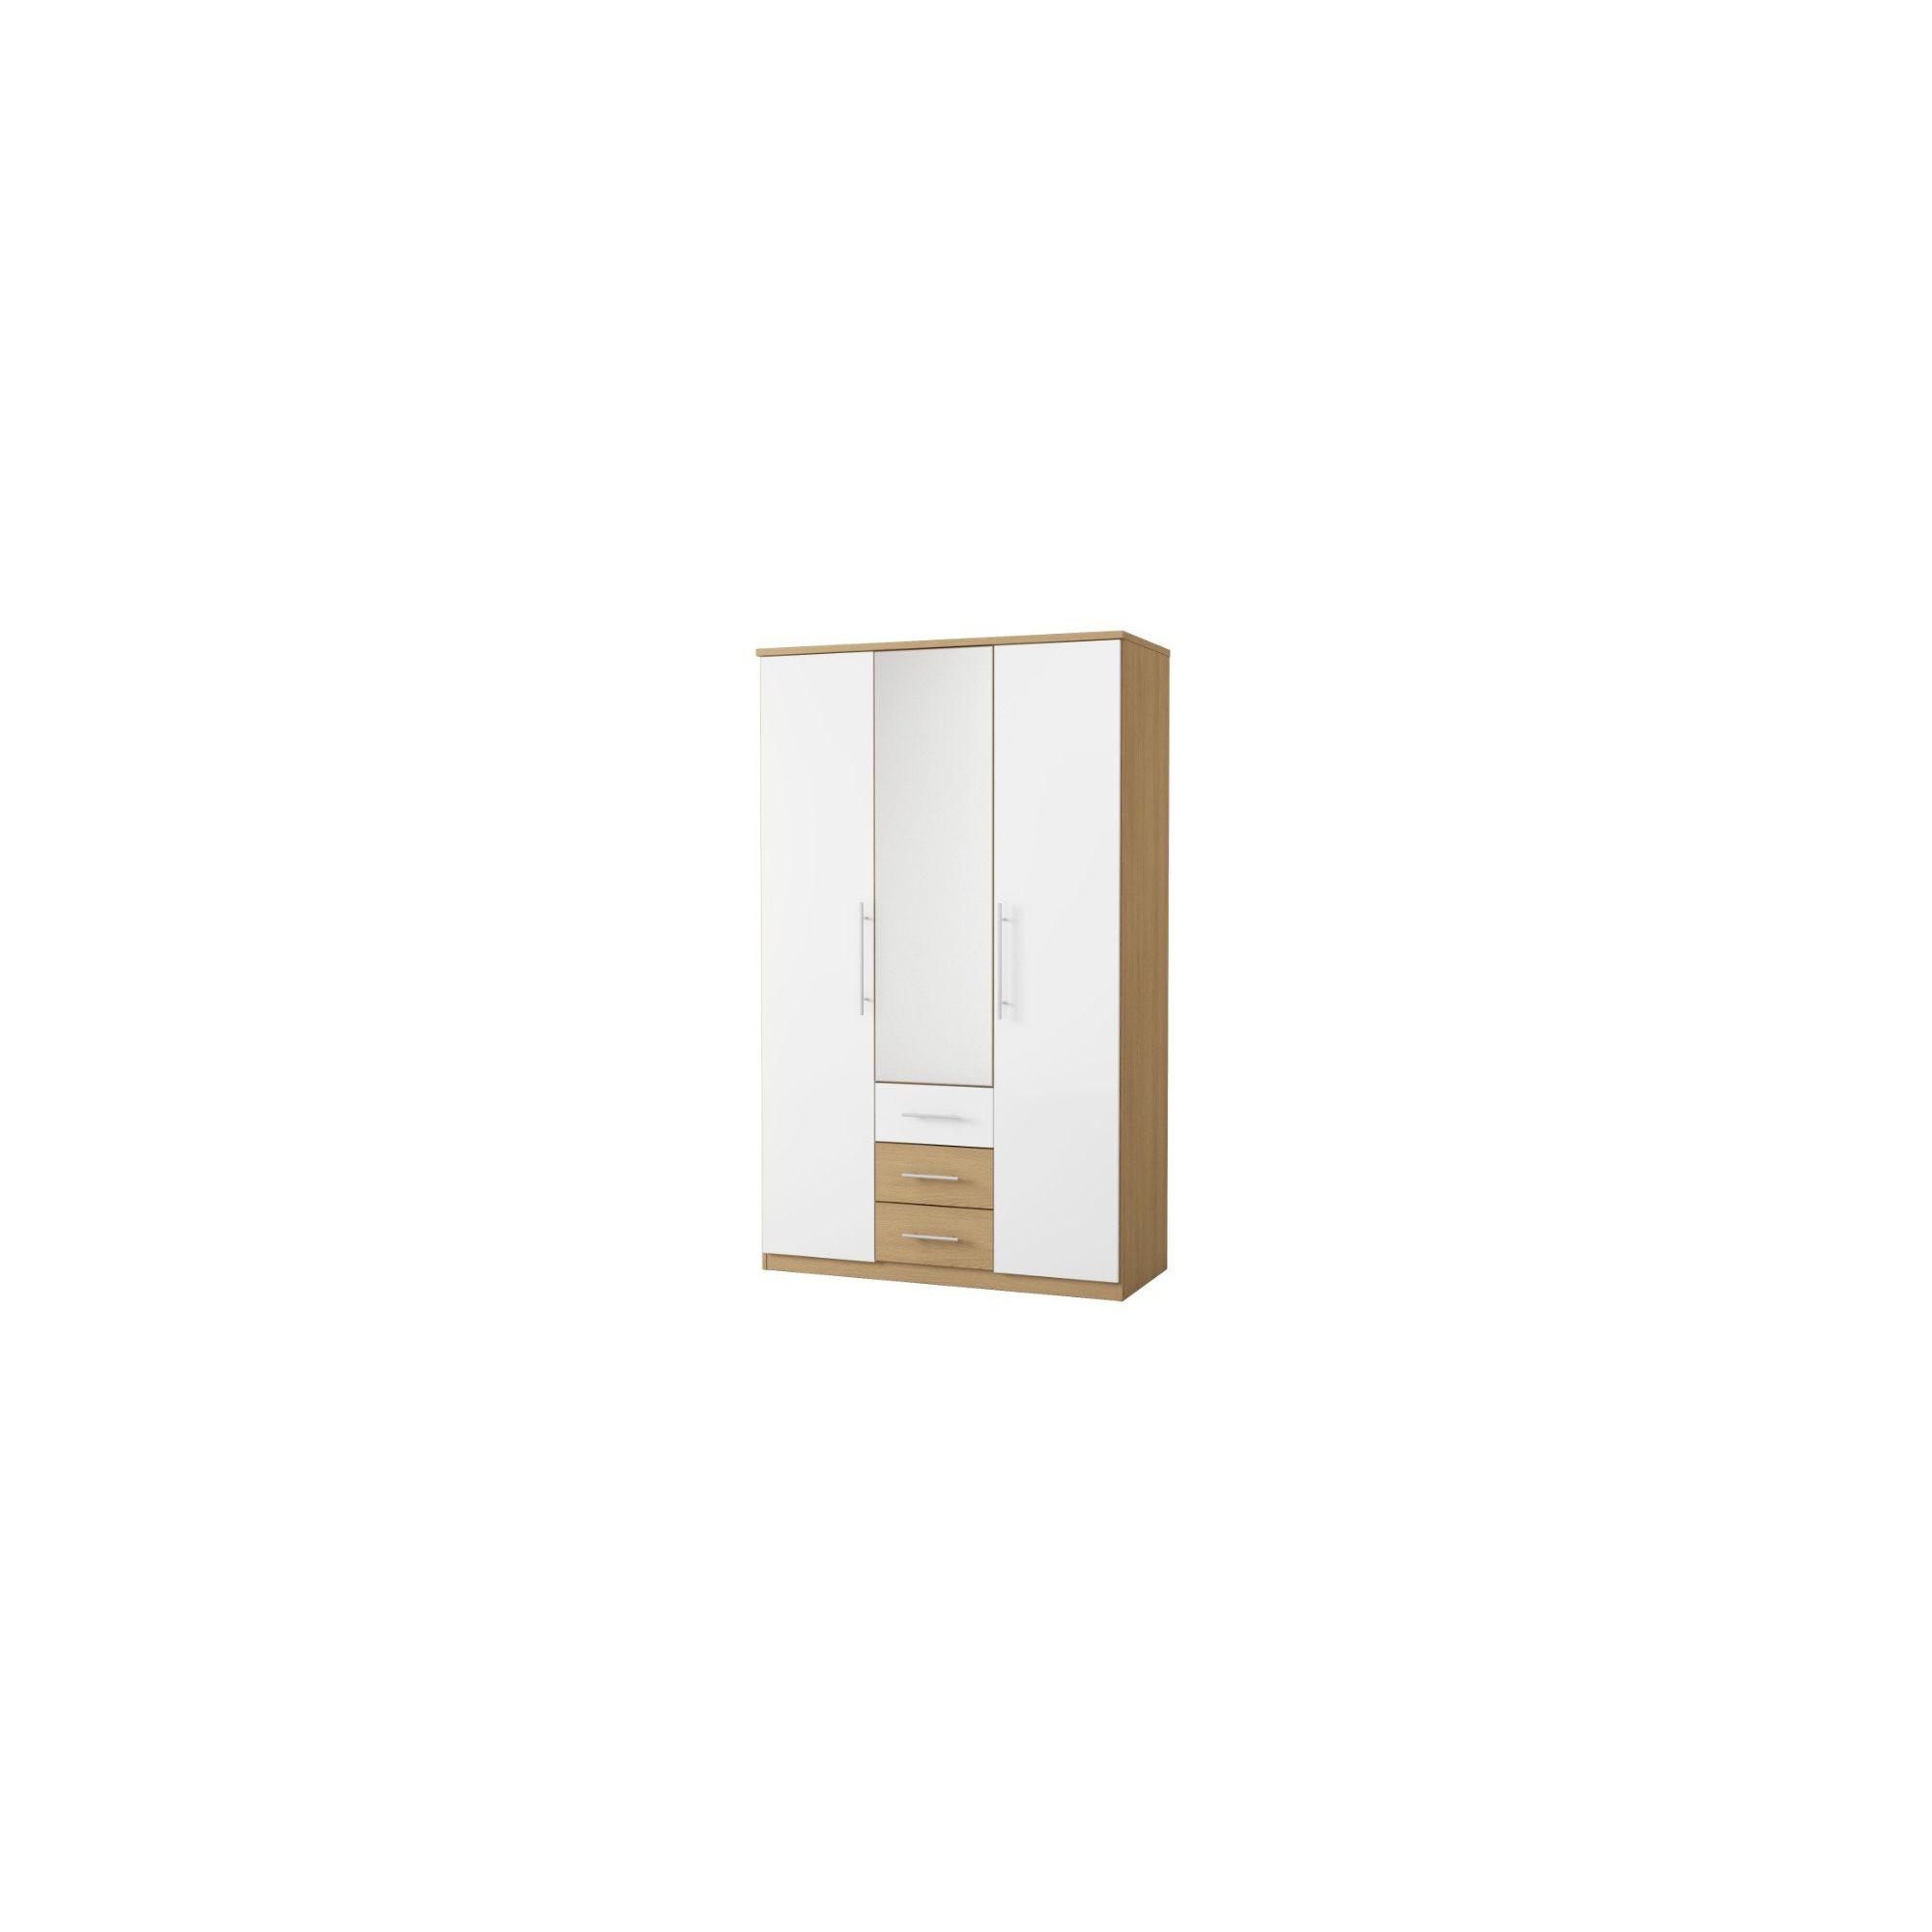 Urbane Designs Sorrento 3 Drawer CNT Mirror Wardrobe at Tescos Direct